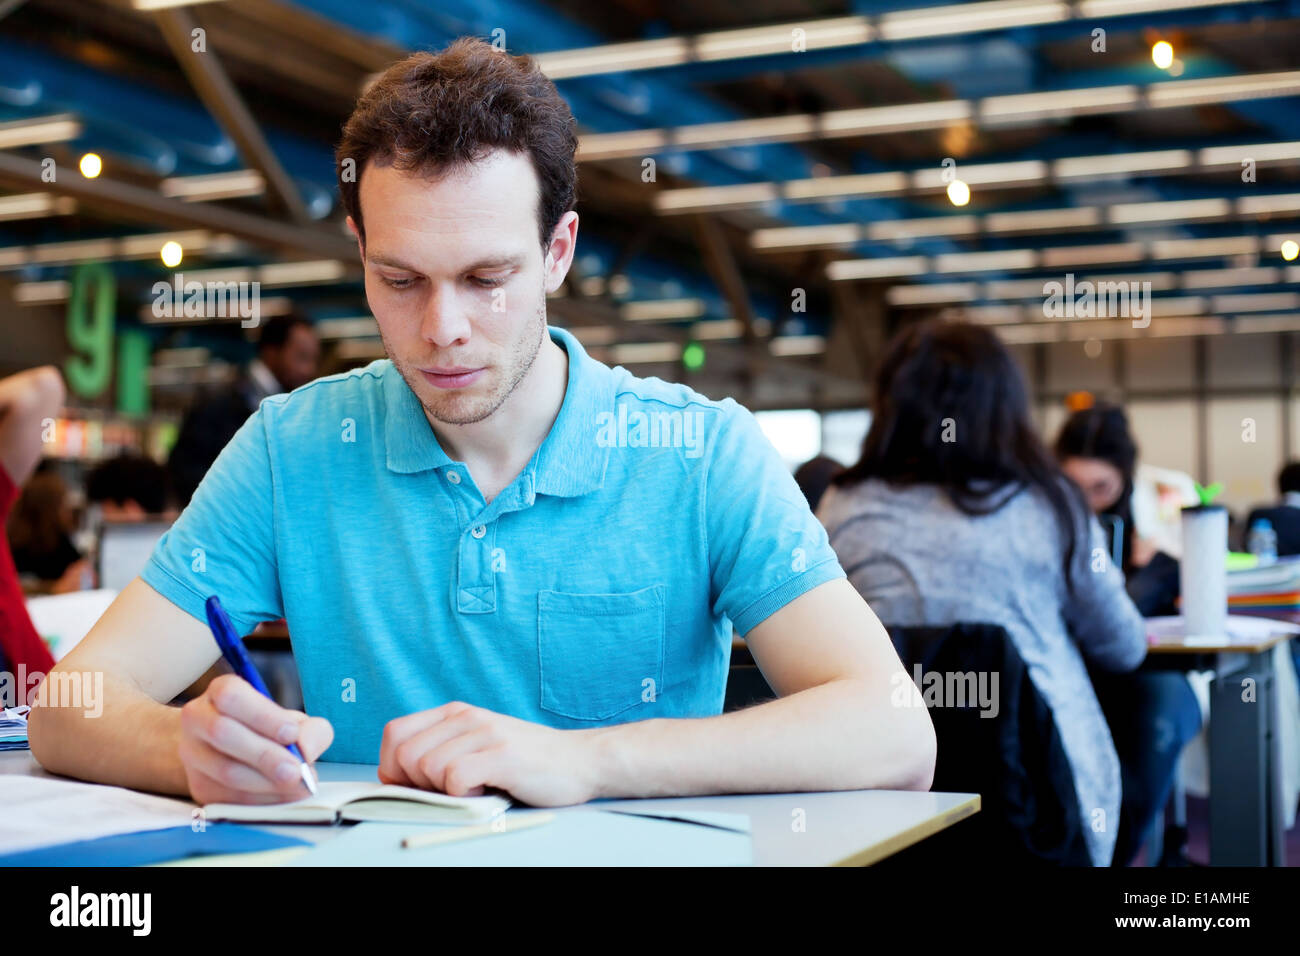 student at university - Stock Image